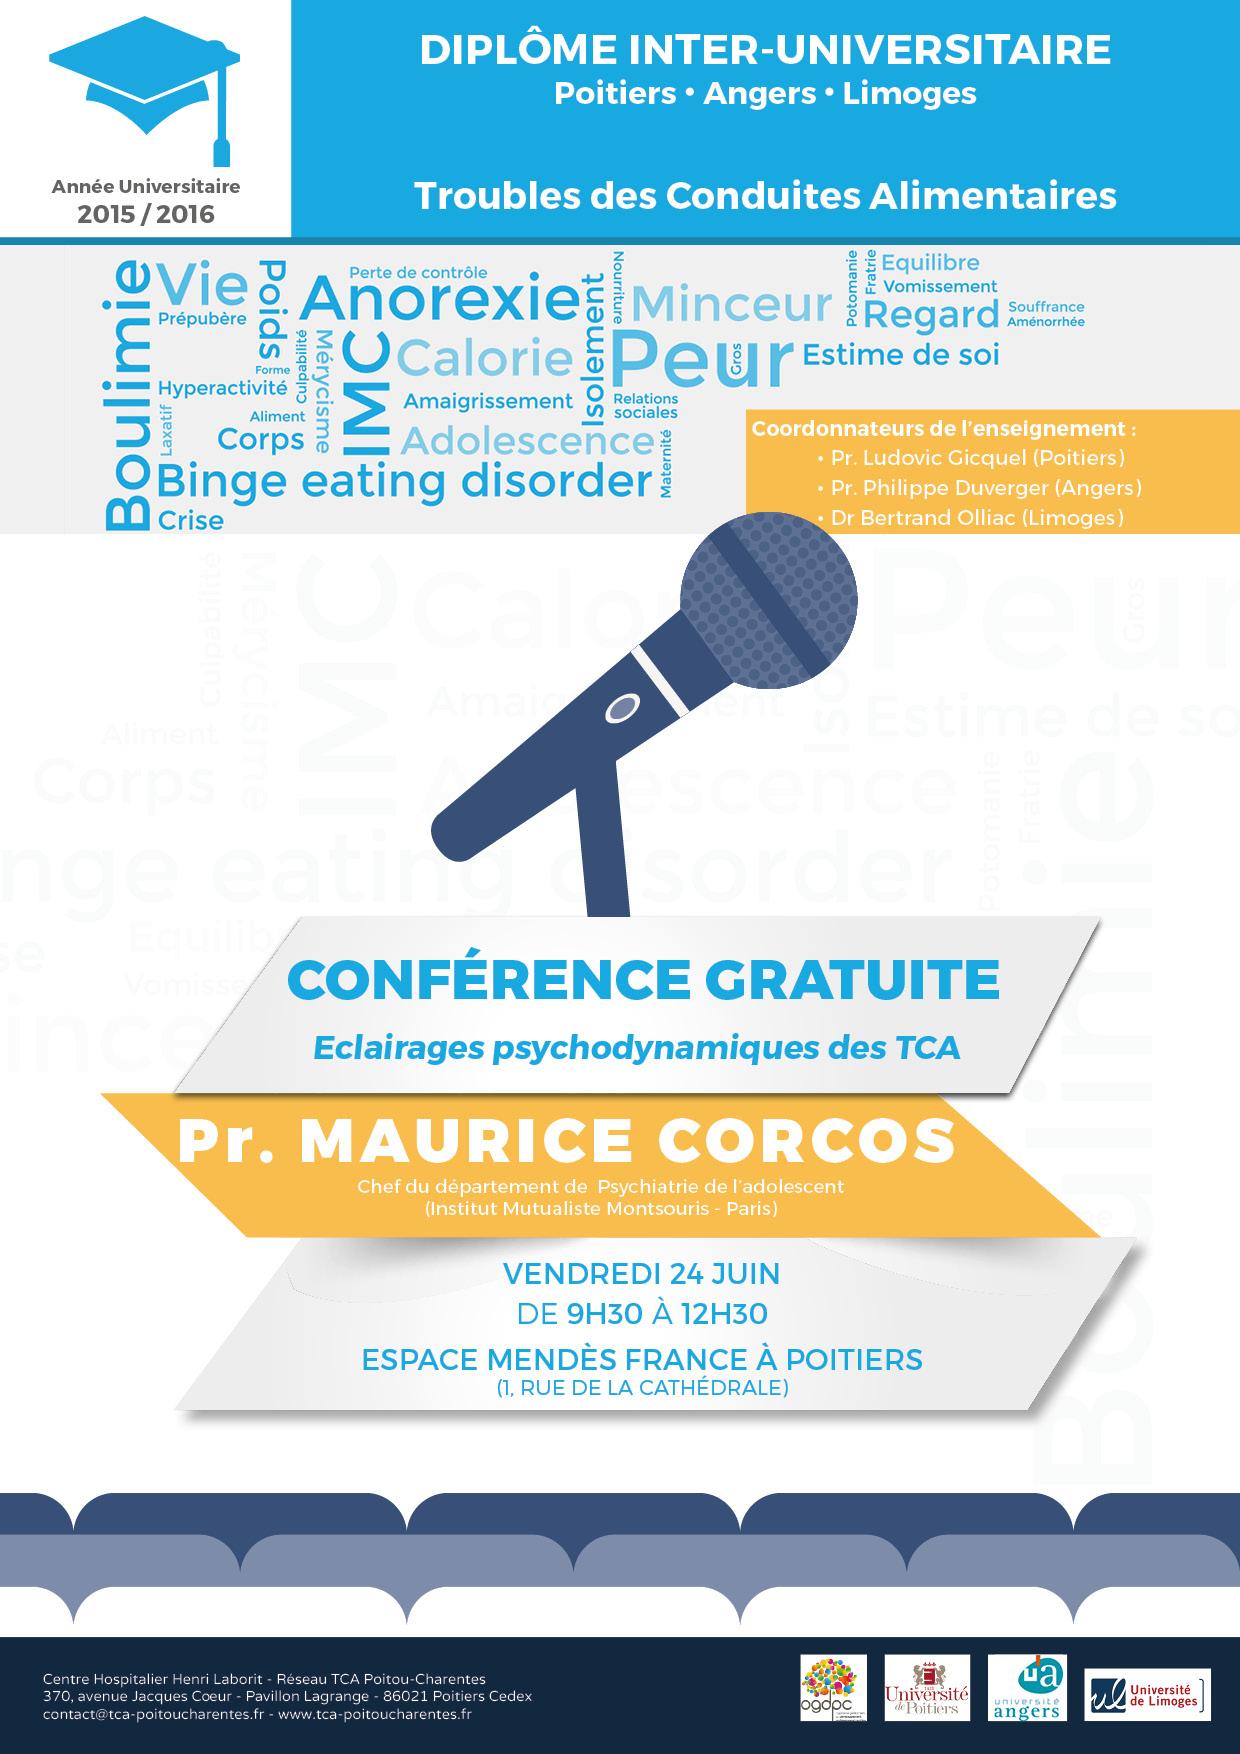 conference_gratuite_V2_web